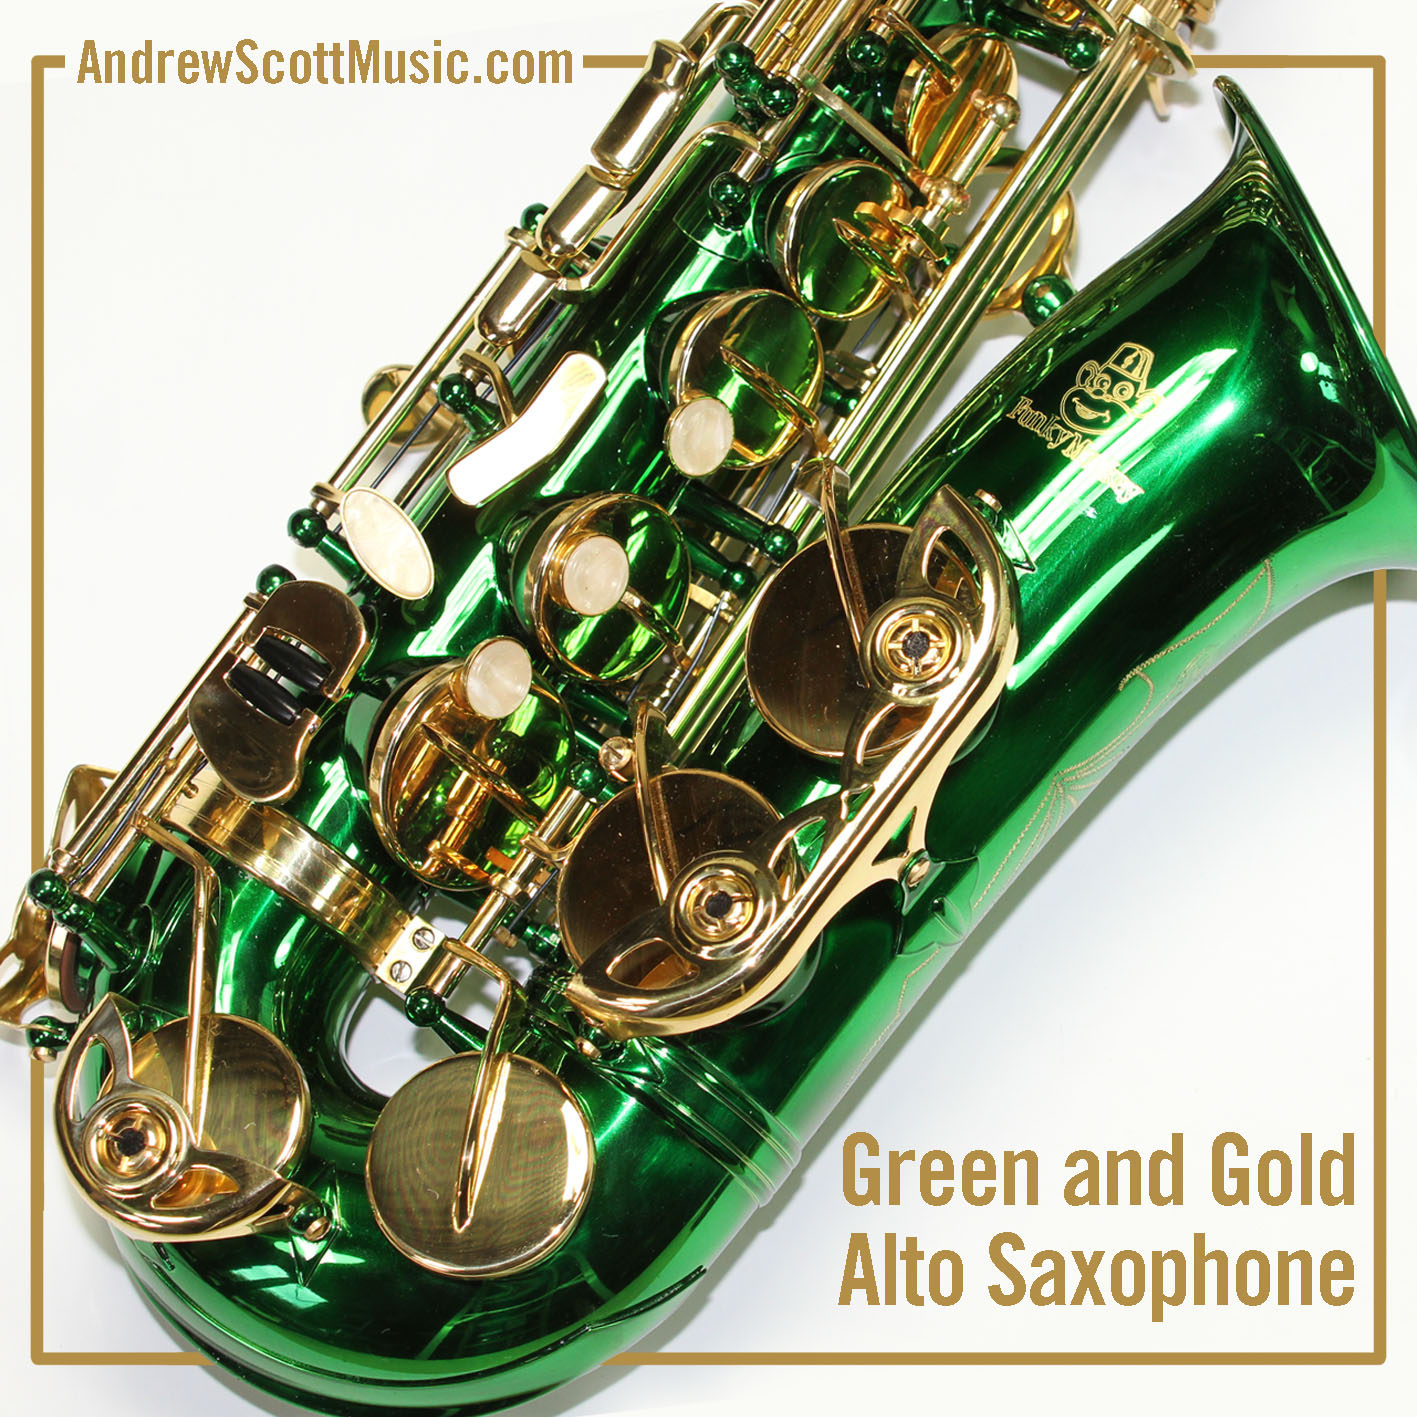 New Green Alto Saxophone in Case - Masterpiece | eBay